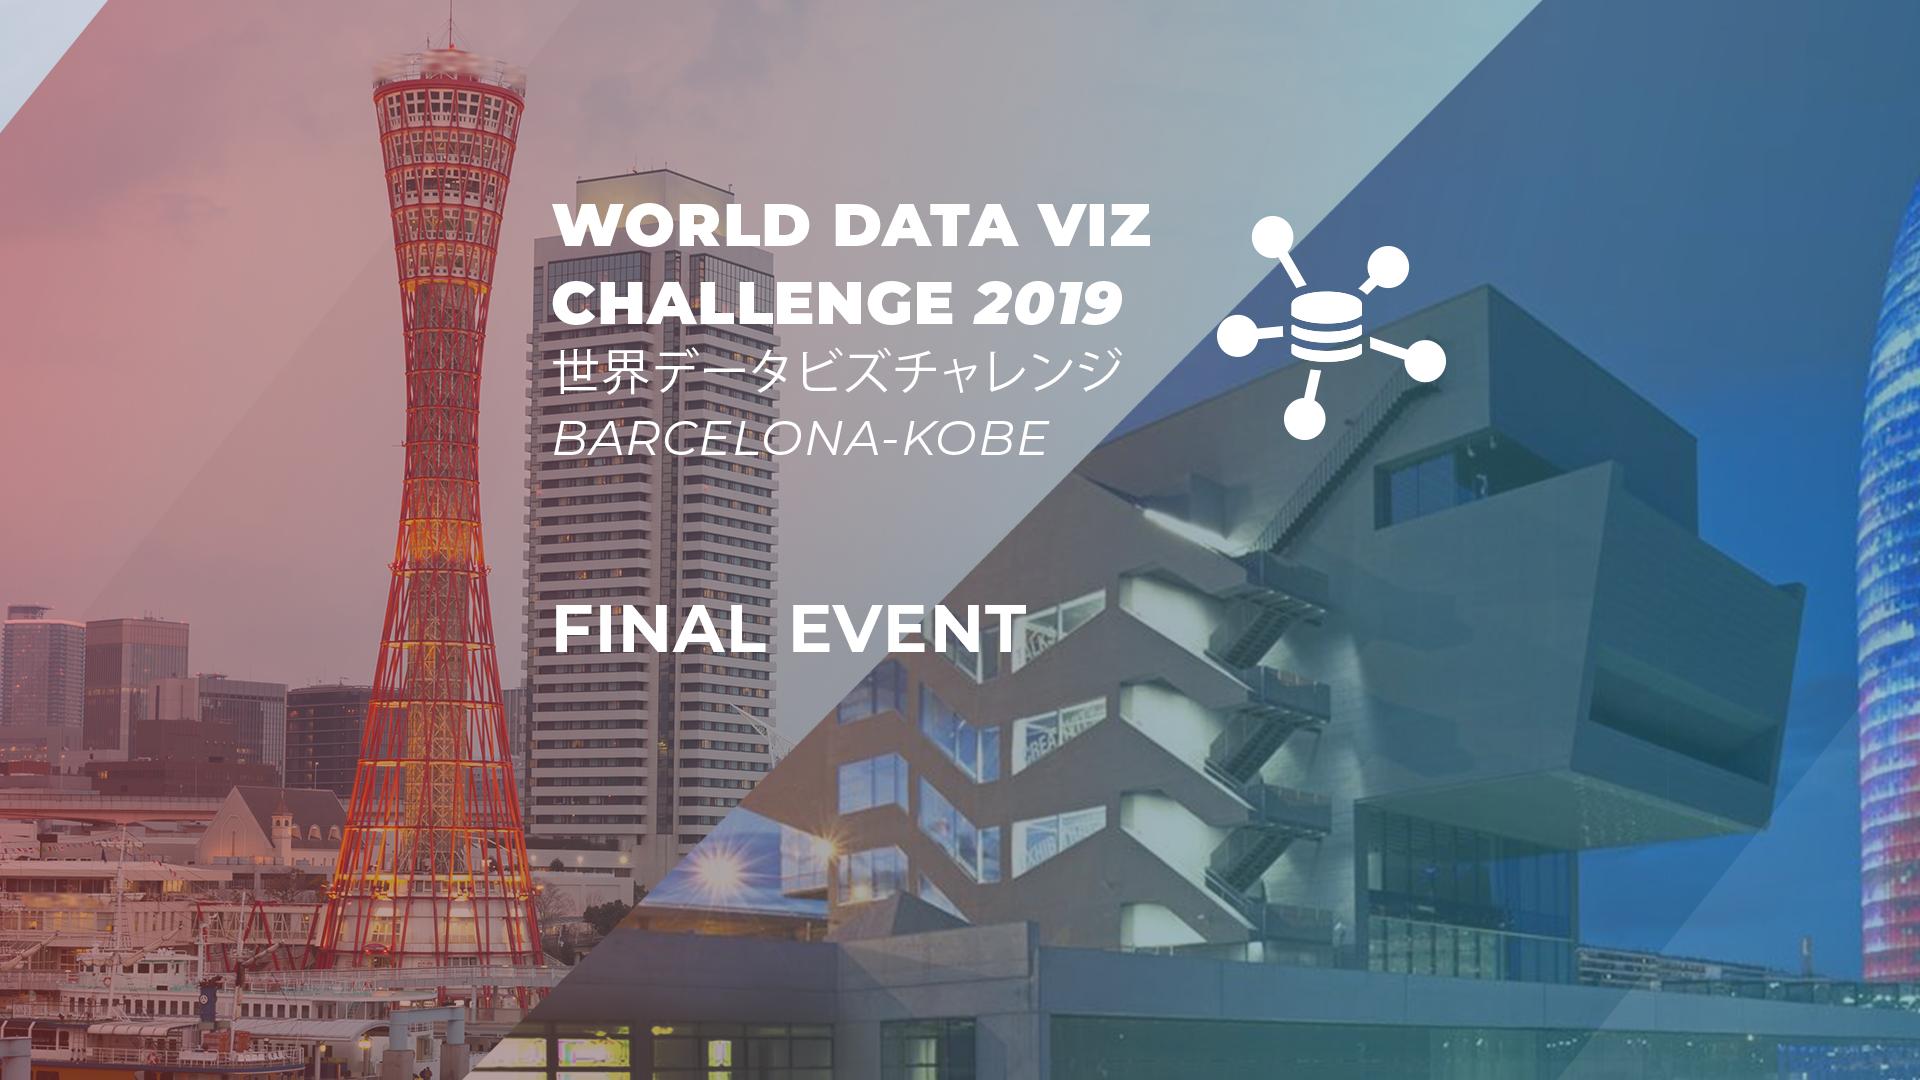 World Data Viz Challenge 2019 Barcelona-Kobe. Esdeveniment ...